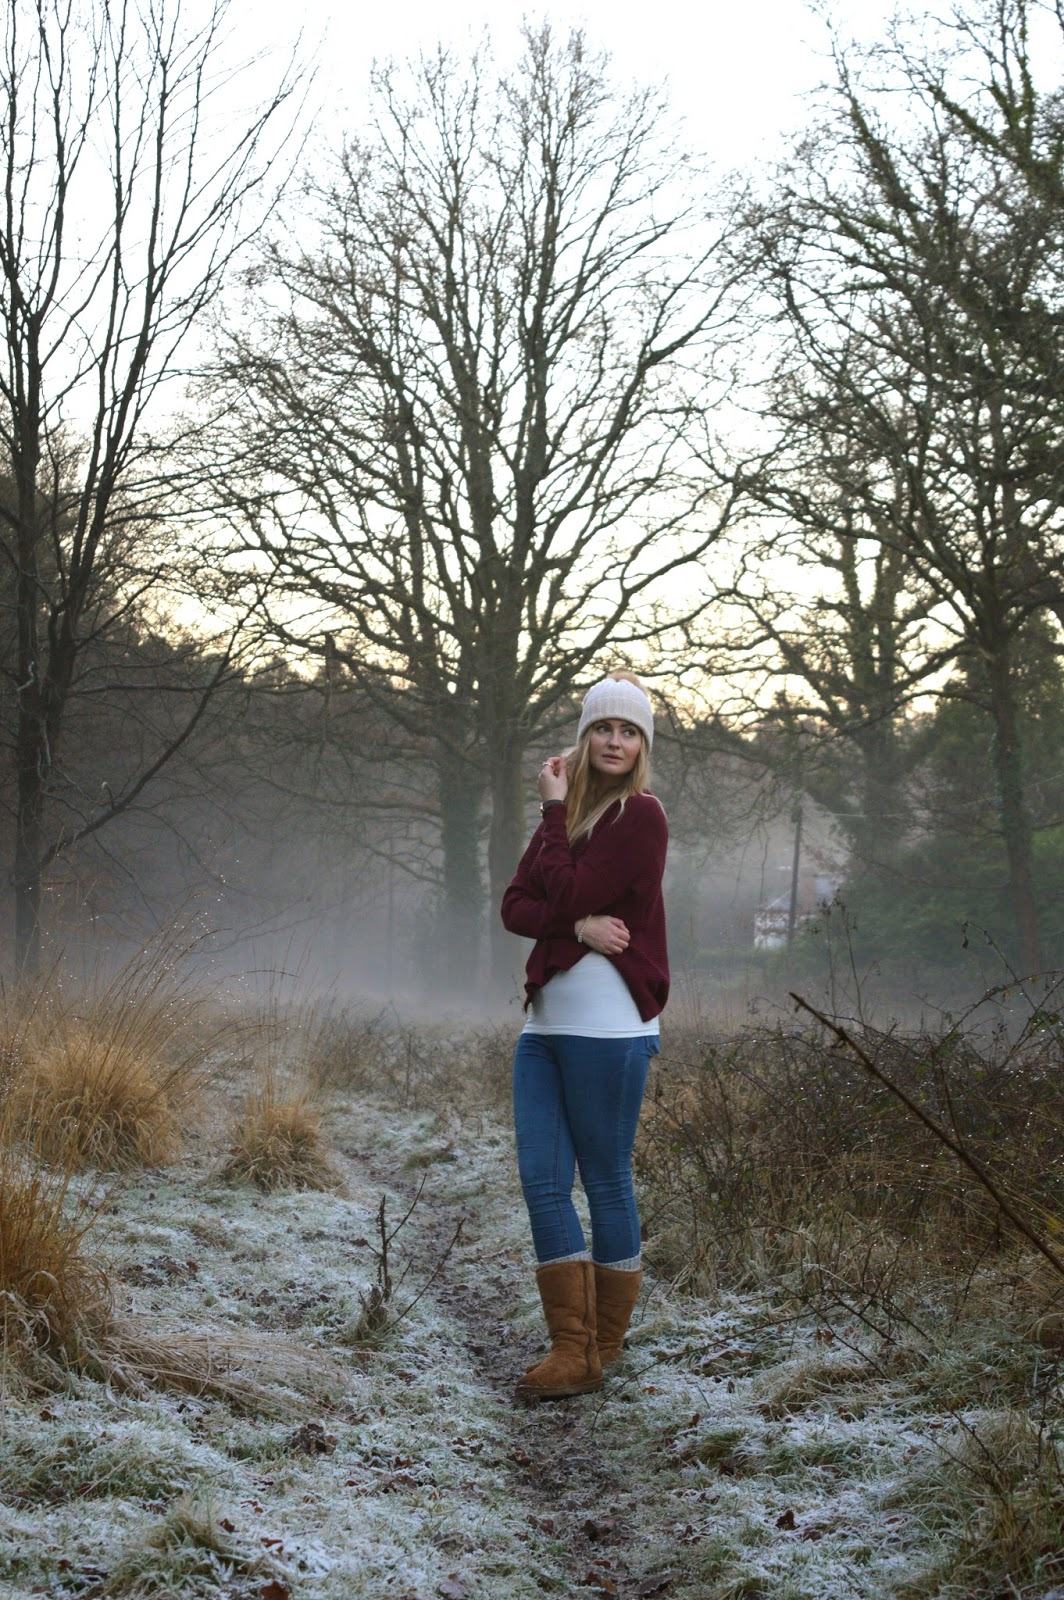 Hampshire bloggers, lifestyle bloggers, fashion bloggers, Dalry Rose blog